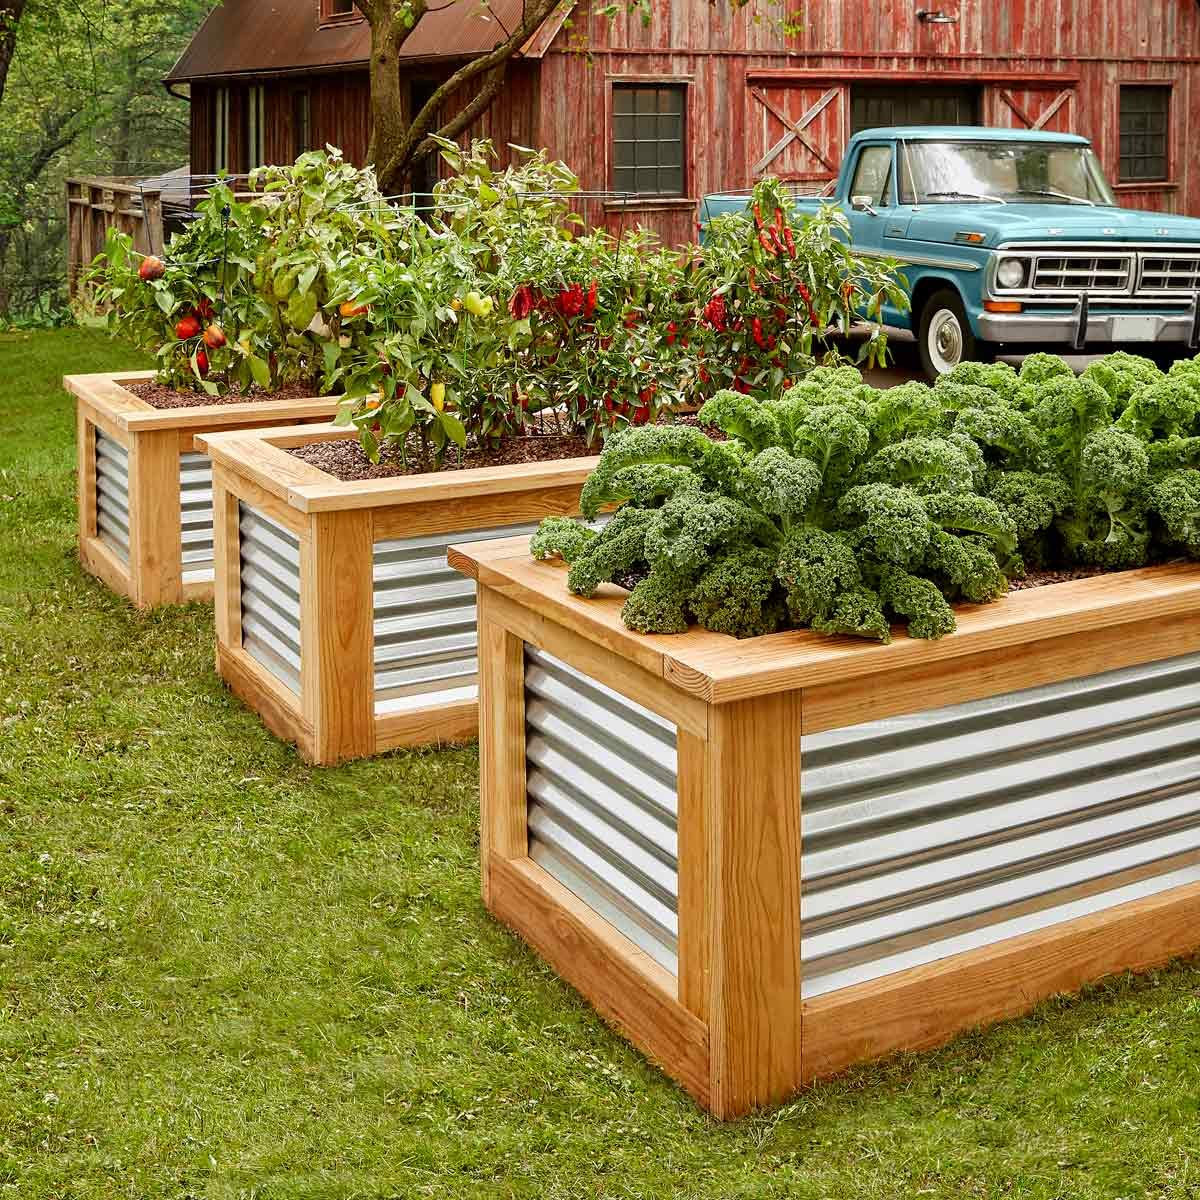 How To Build Raised Garden Beds Diy Family Handyman